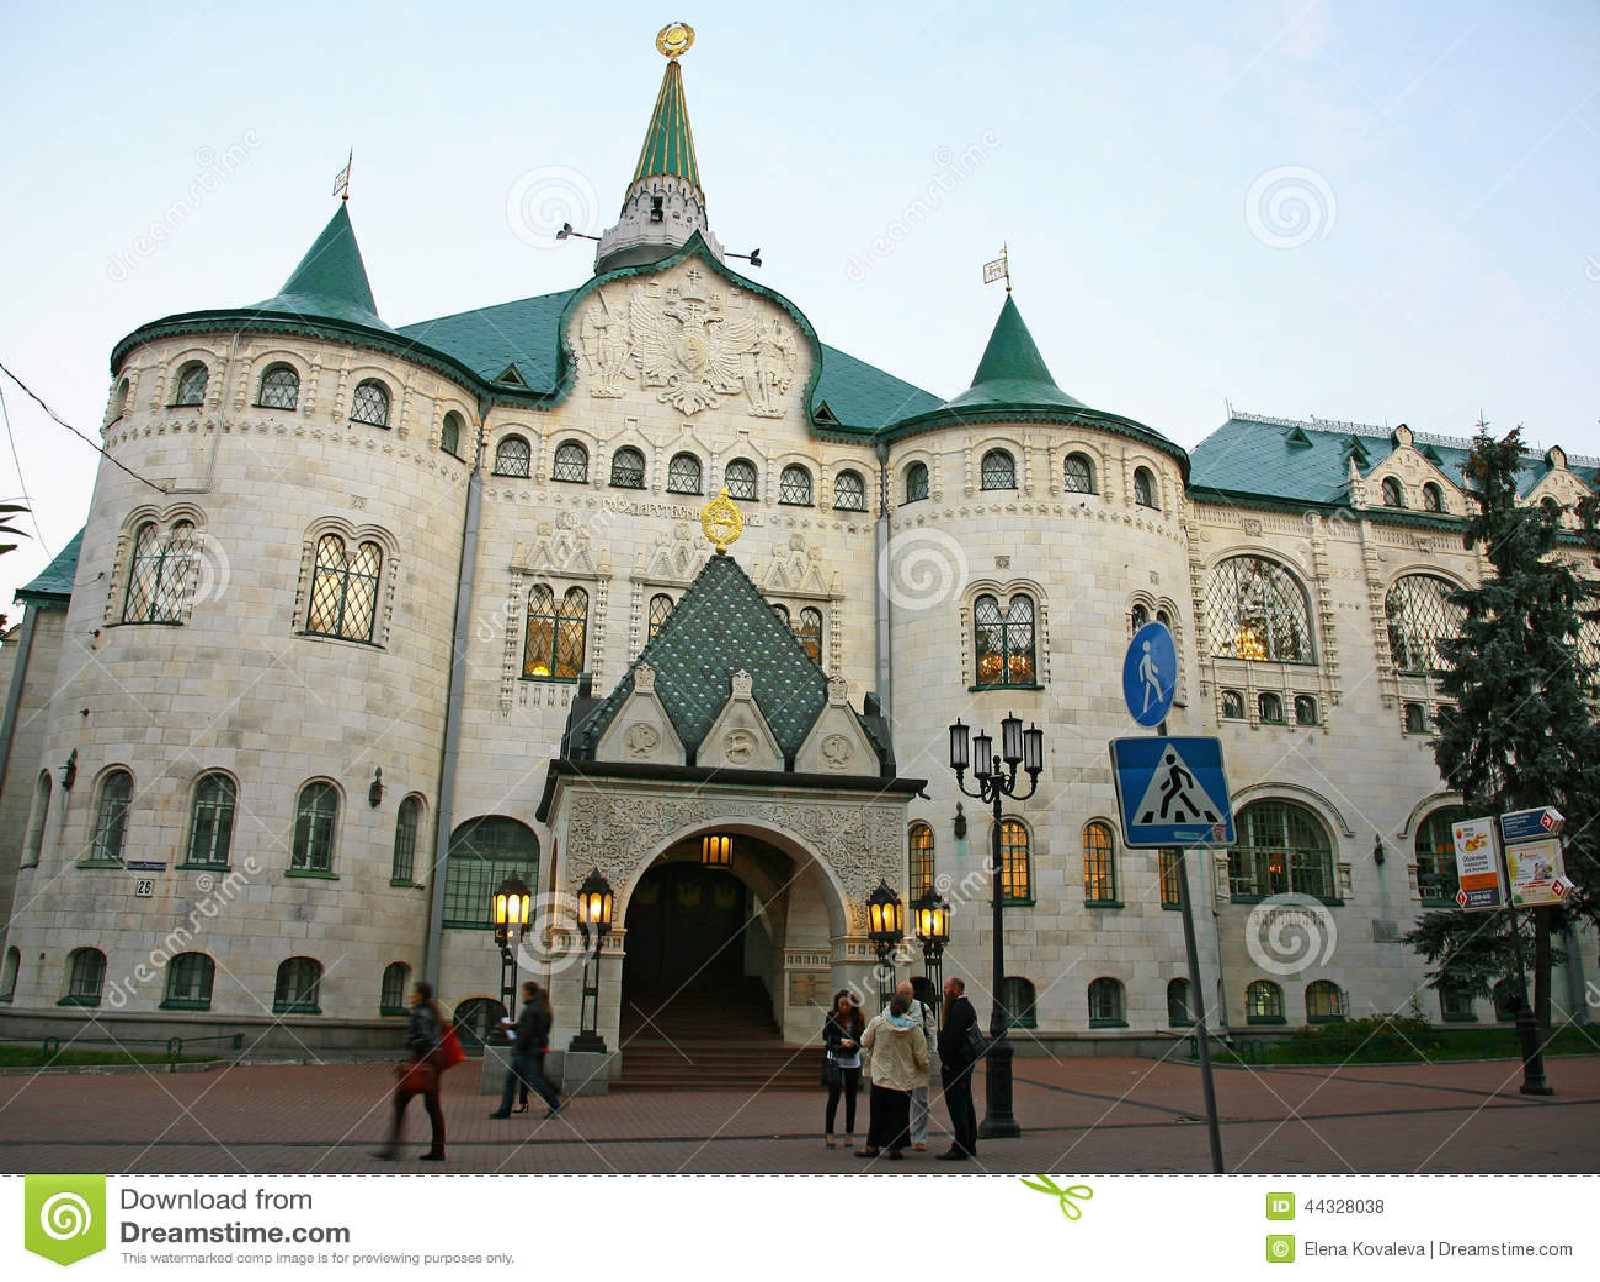 Russia, nizhny novgorod - september 08, 2014: central bank of russia